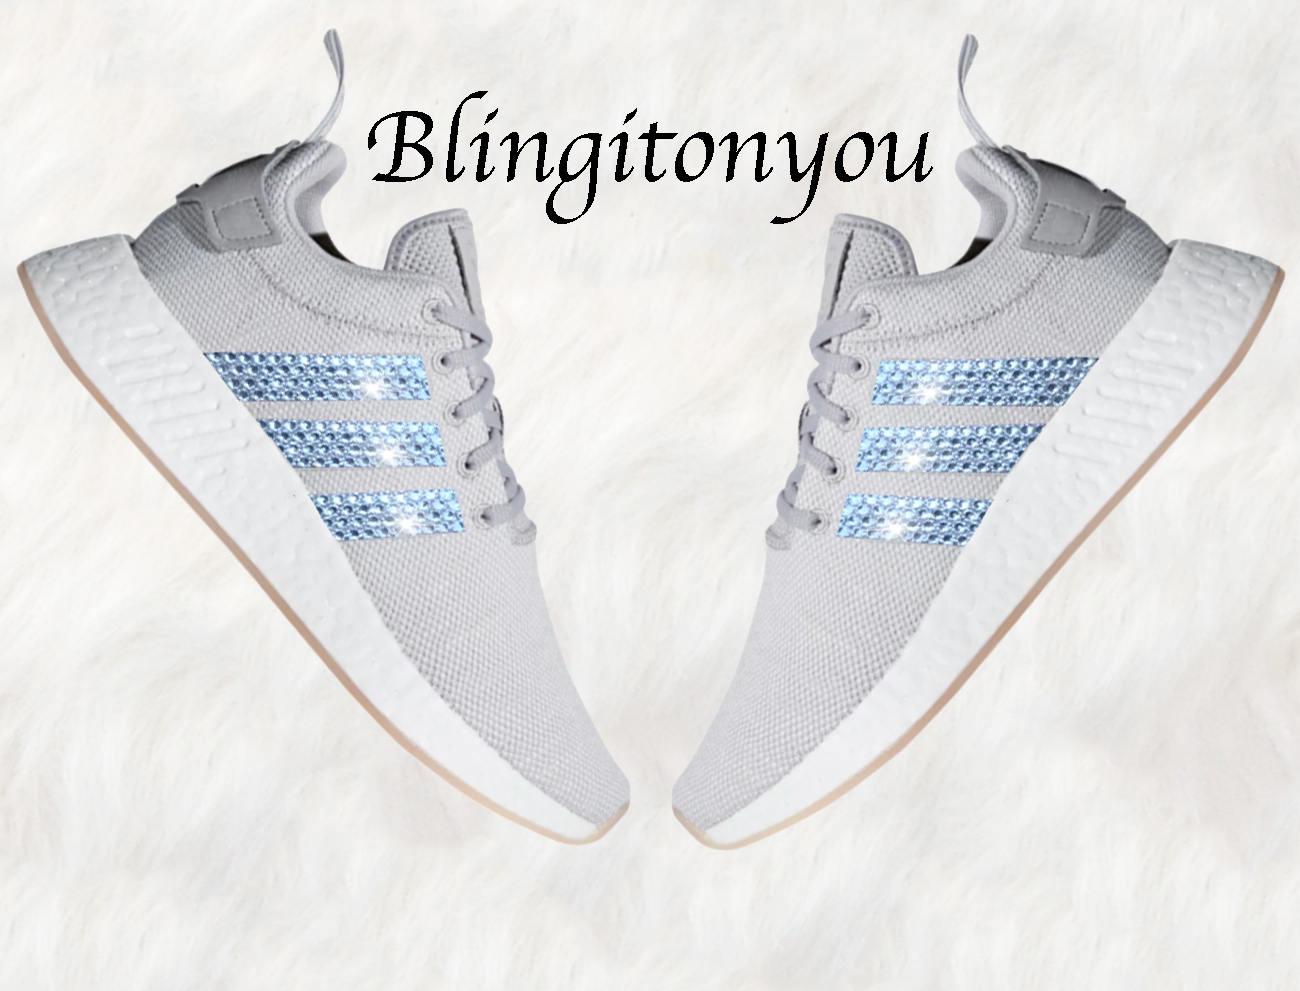 super popular 1eea2 93b0c Grigio Swarovski Adidas Originals NMD R2 Bling-scarpe donna   Etsy